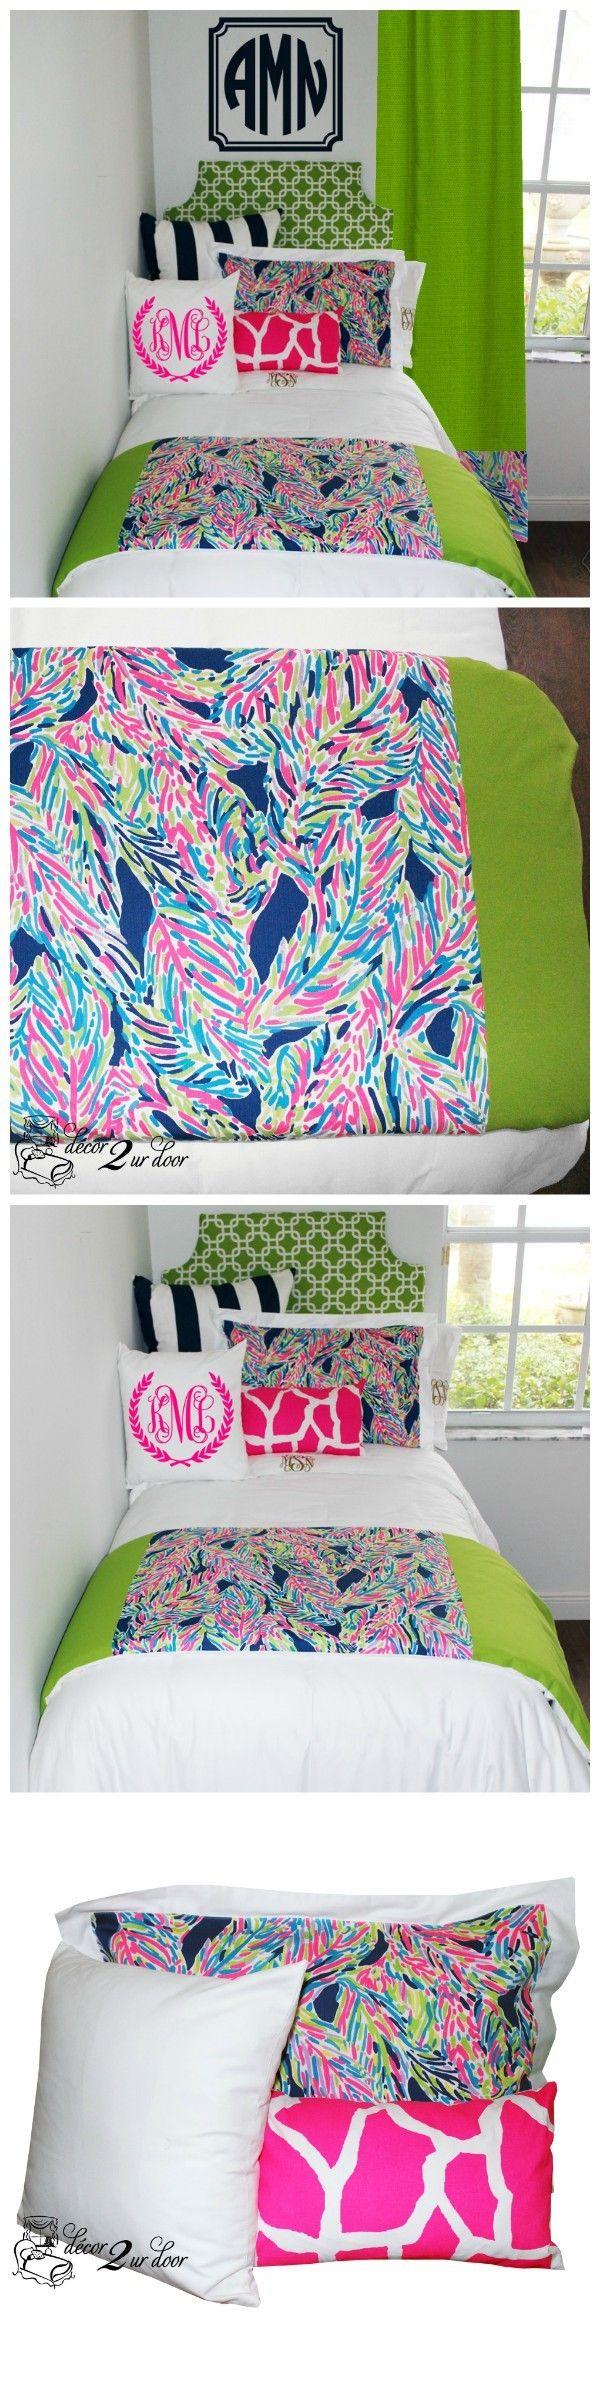 lilly multicolor feathers dorm u0026 teen designer bedding set